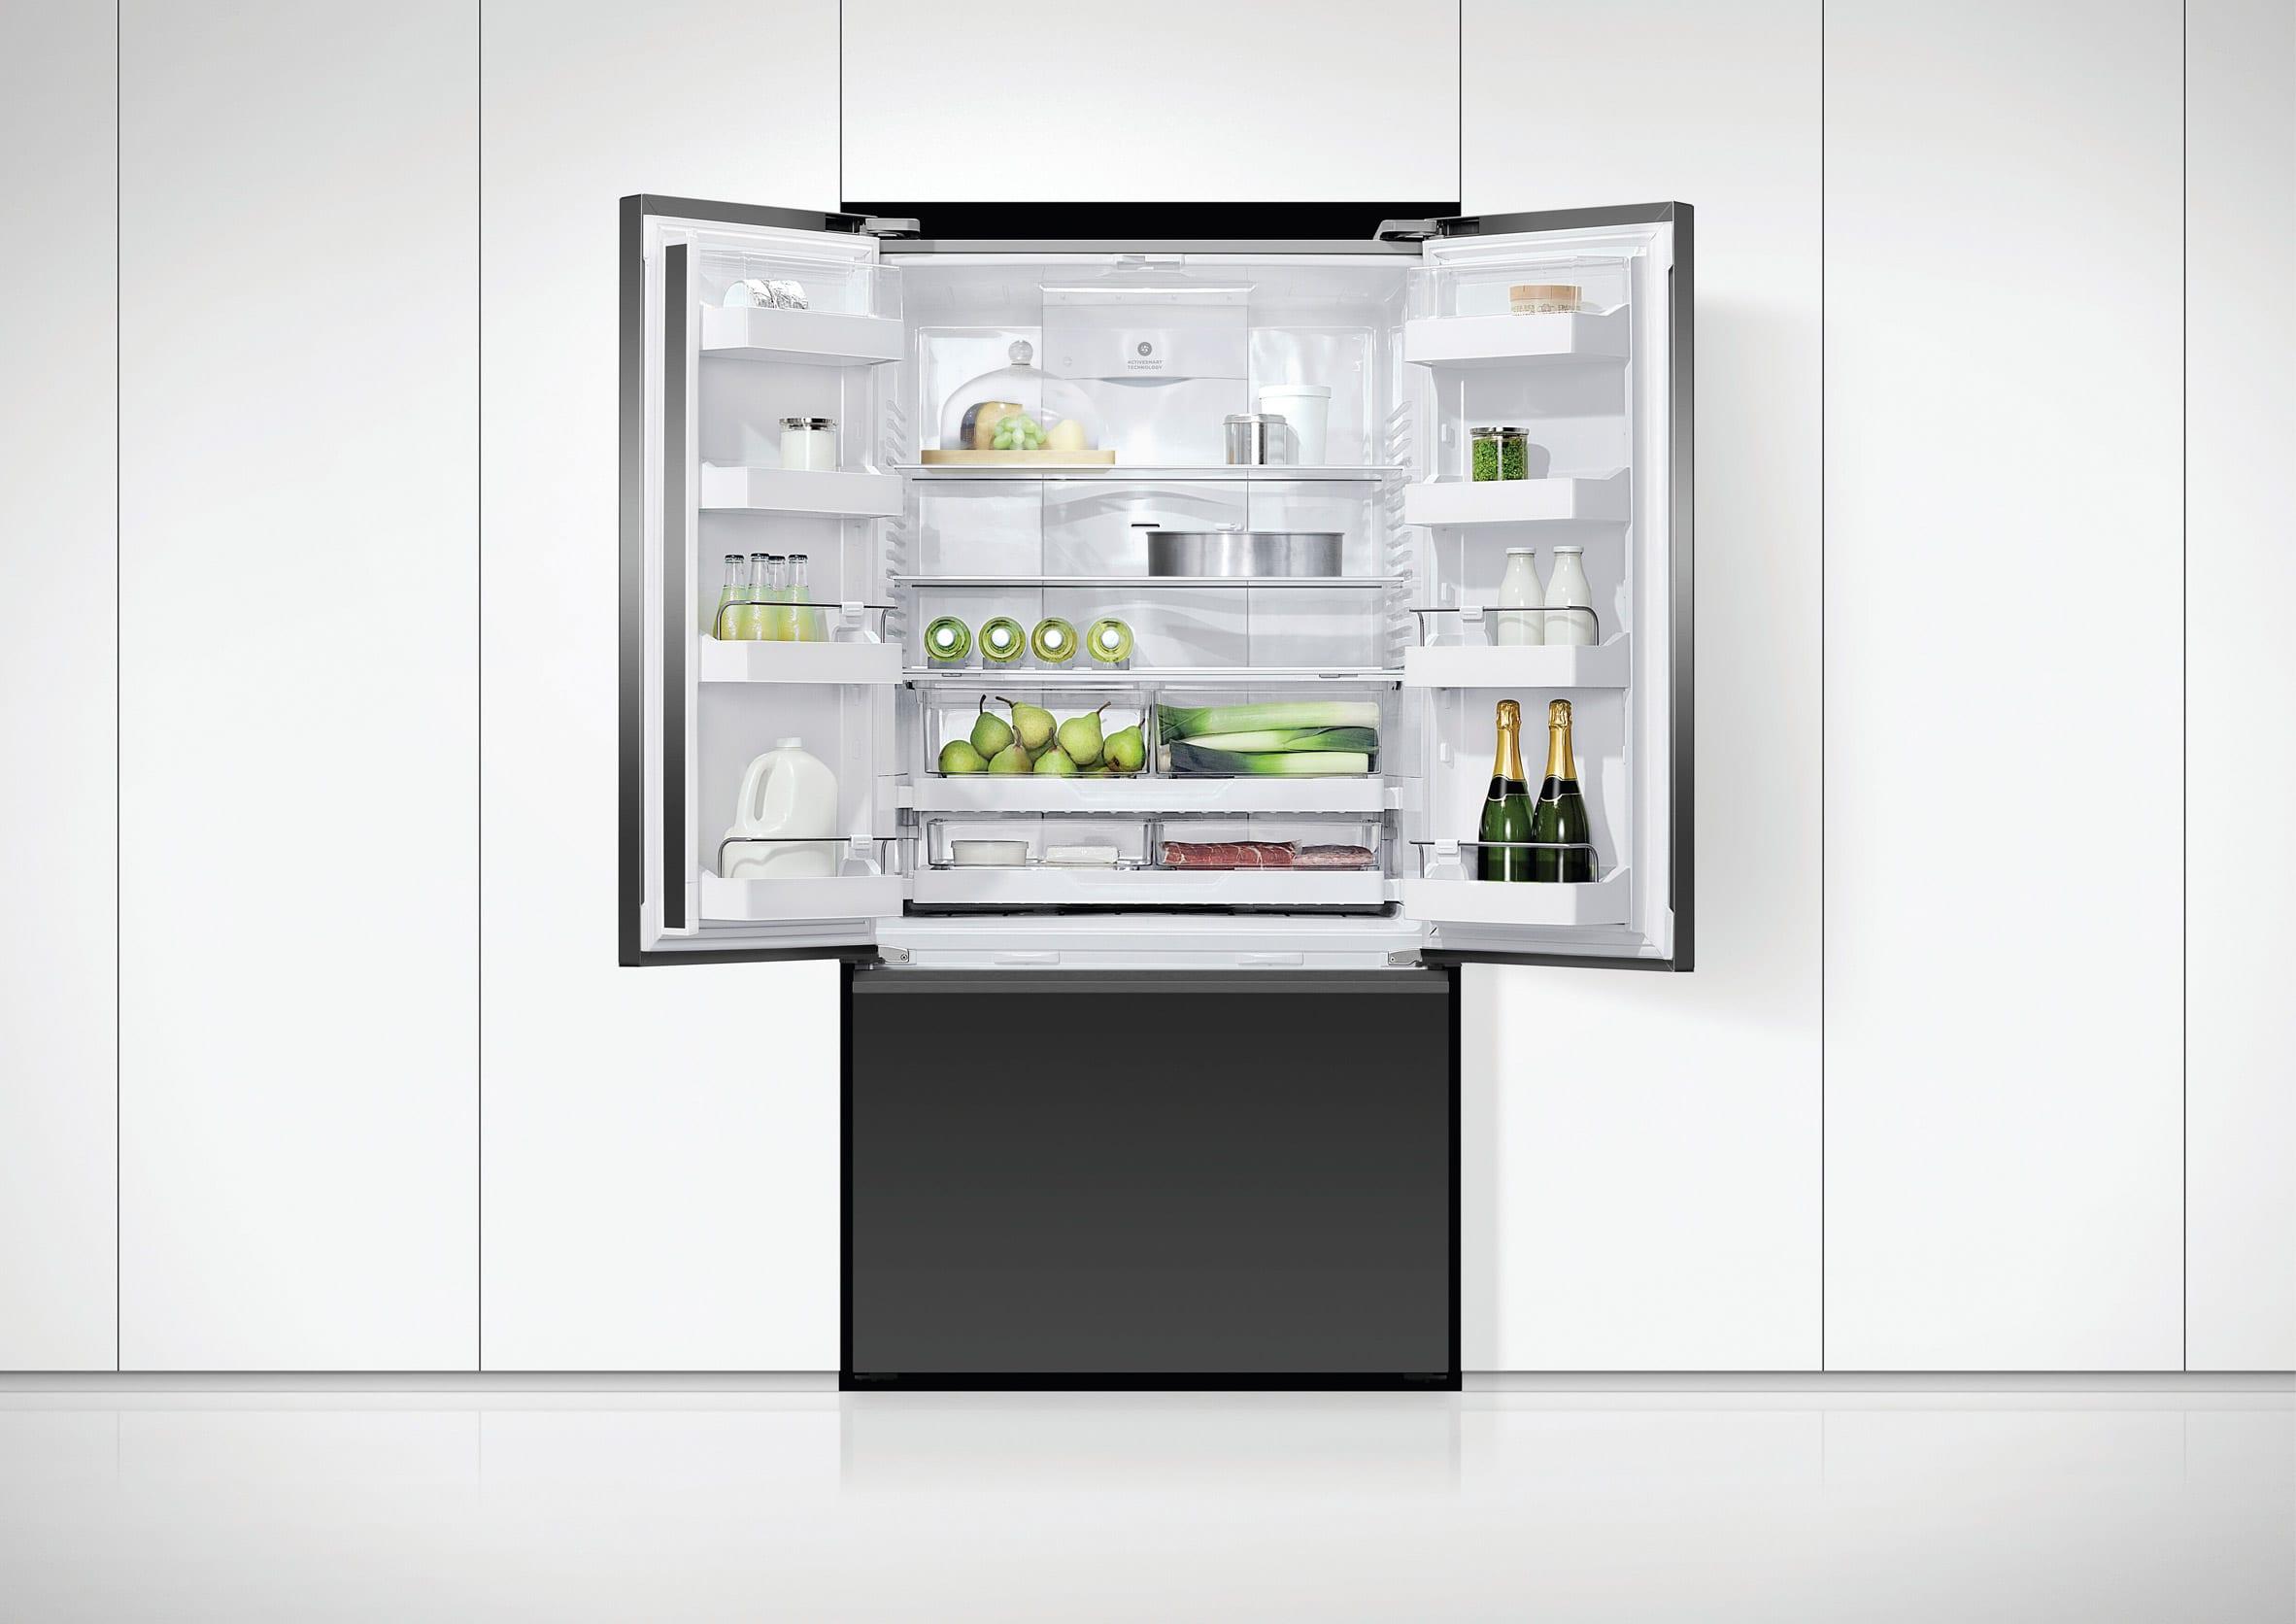 French door fridge freezer by Fisher & Paykel